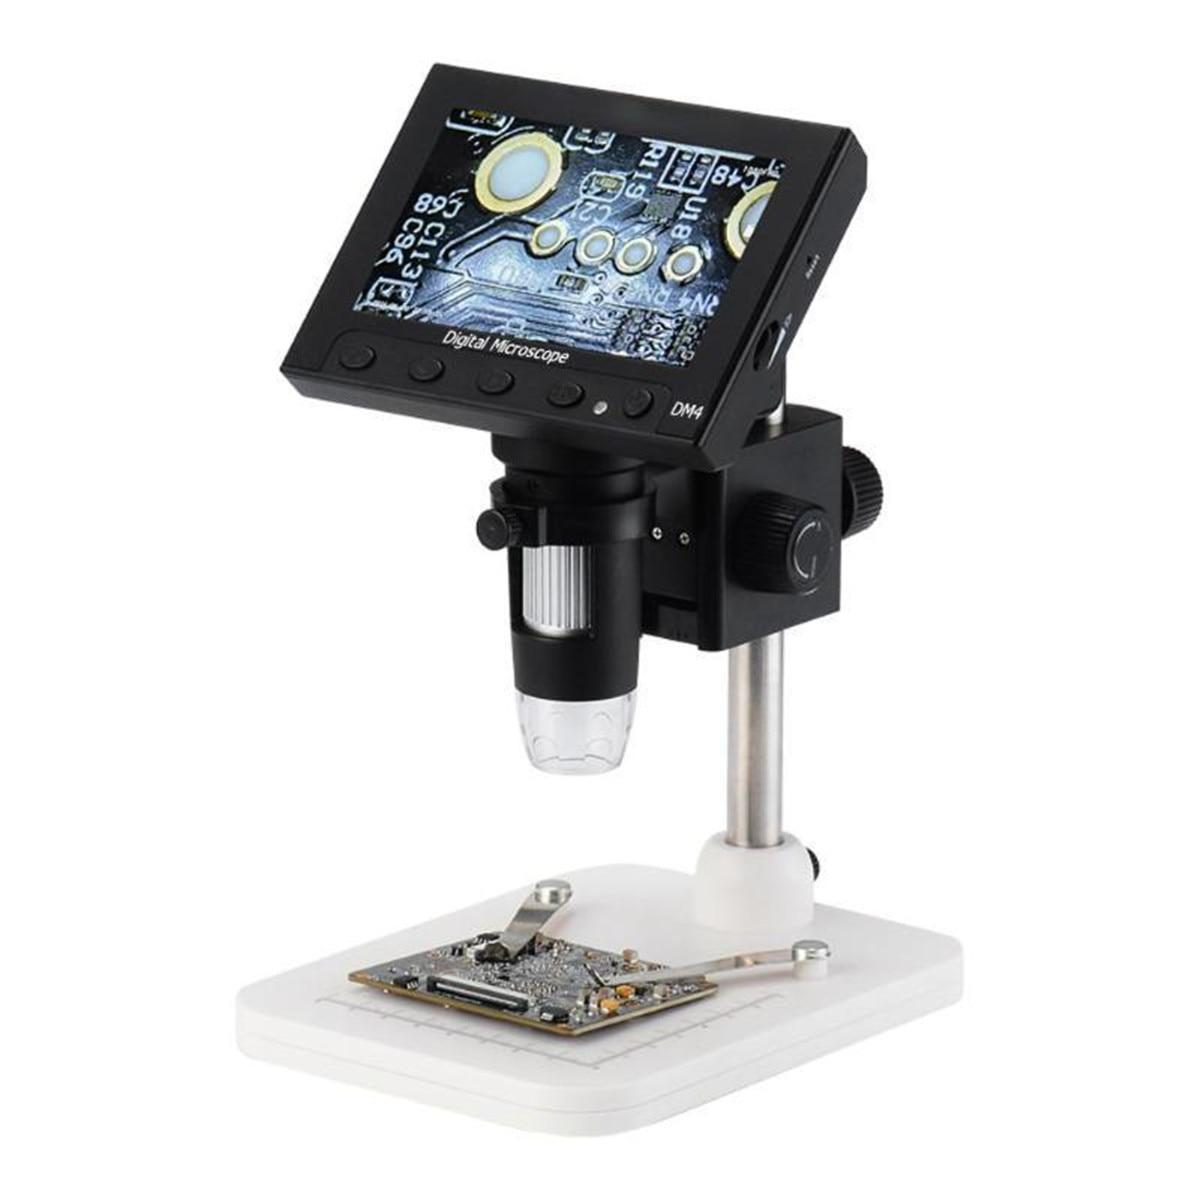 DM4 1000x 2.0MP USB Digital Electronic Microscope 4.3LCD Display VGA Microscope with 8LED and StentDM4 1000x 2.0MP USB Digital Electronic Microscope 4.3LCD Display VGA Microscope with 8LED and Stent